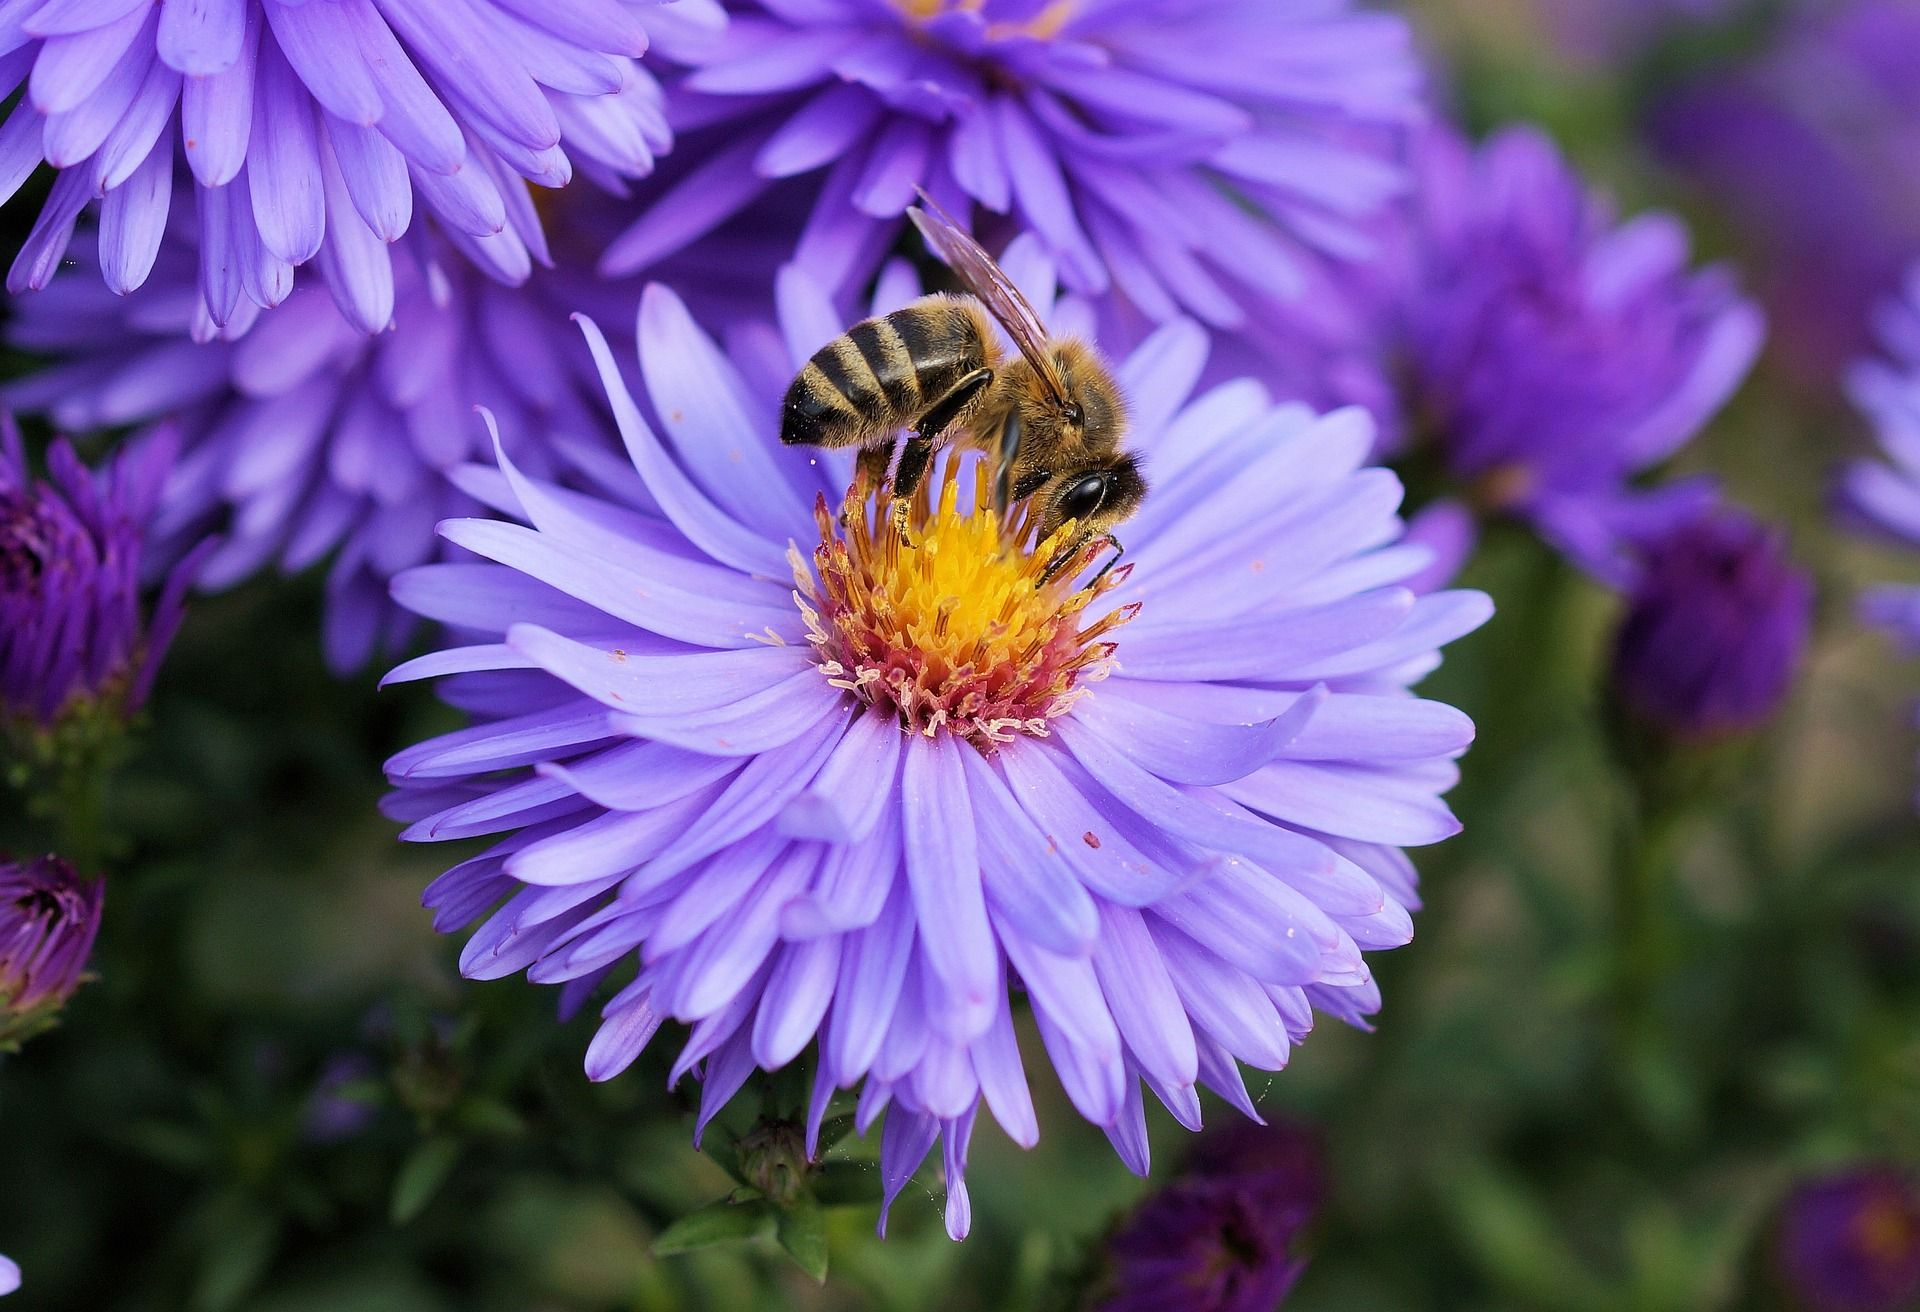 Gelée Royal – Hauptnahrungsmittel der Bienenkönigin